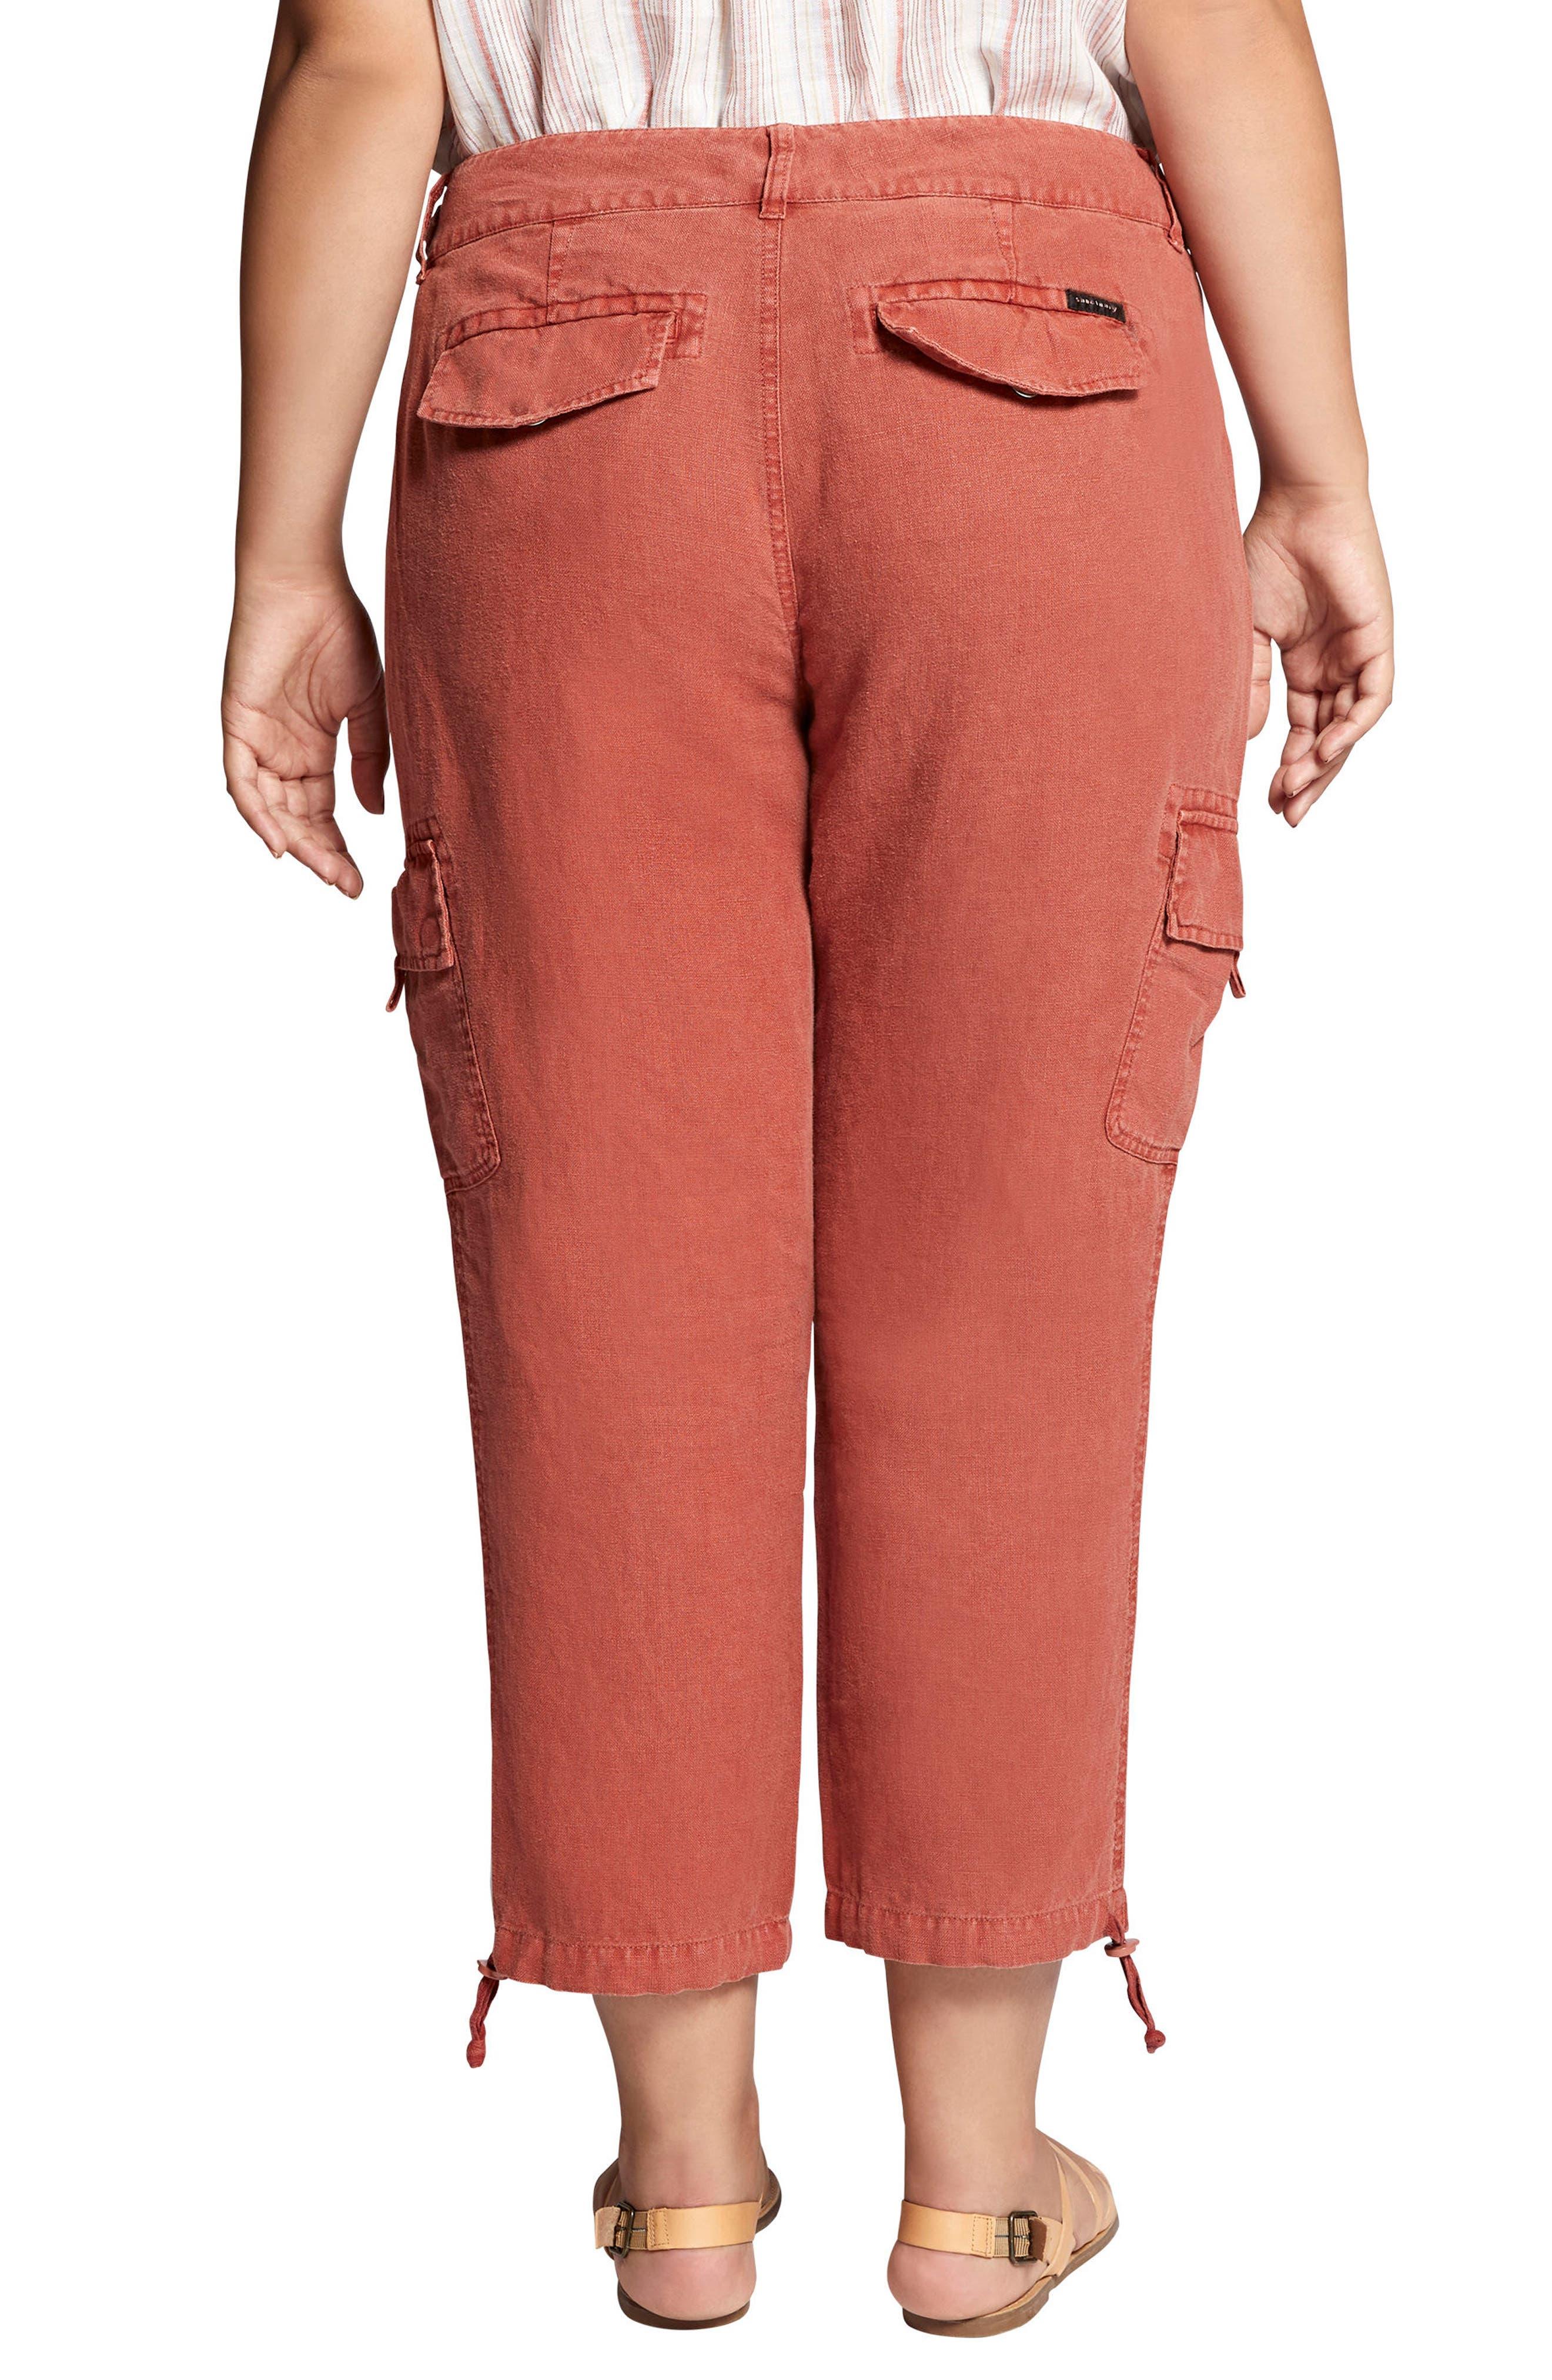 Terrain Crop Linen Cargo Pants,                             Alternate thumbnail 2, color,                             Terra Cotta